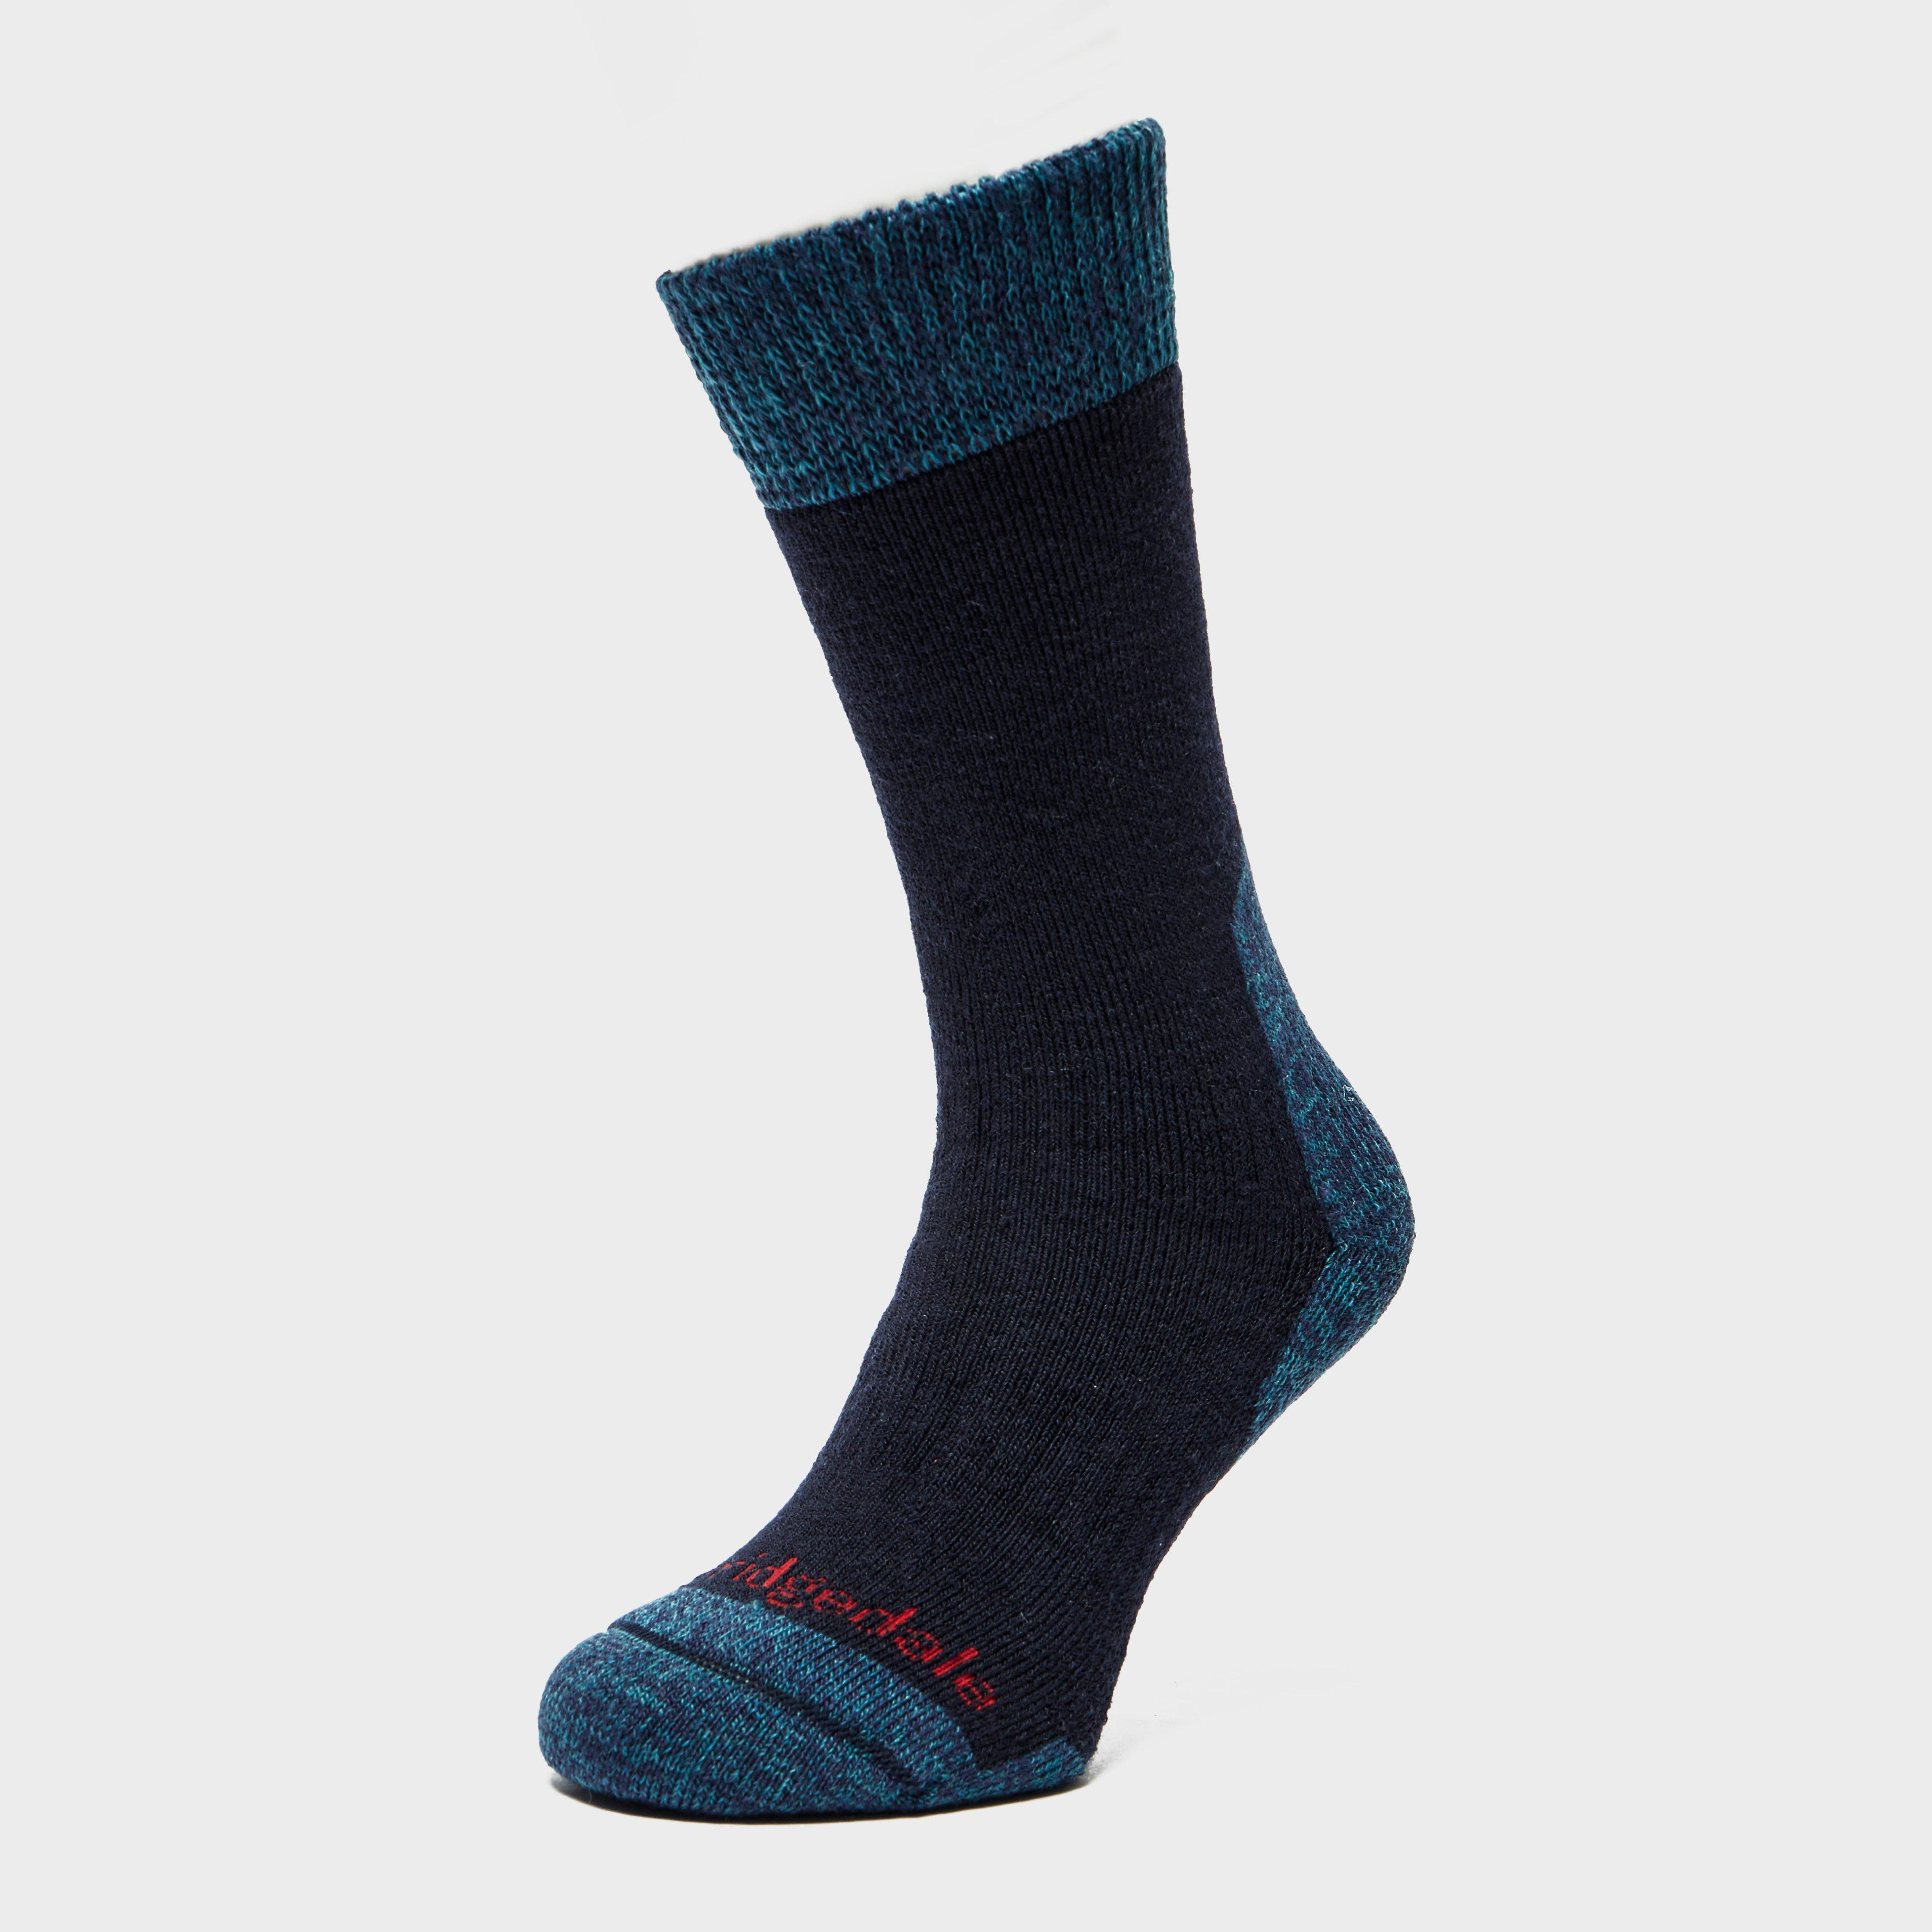 Bridgedale Bridgedale Mens Explorer Heavyweight Boot Sock - Navy, Navy